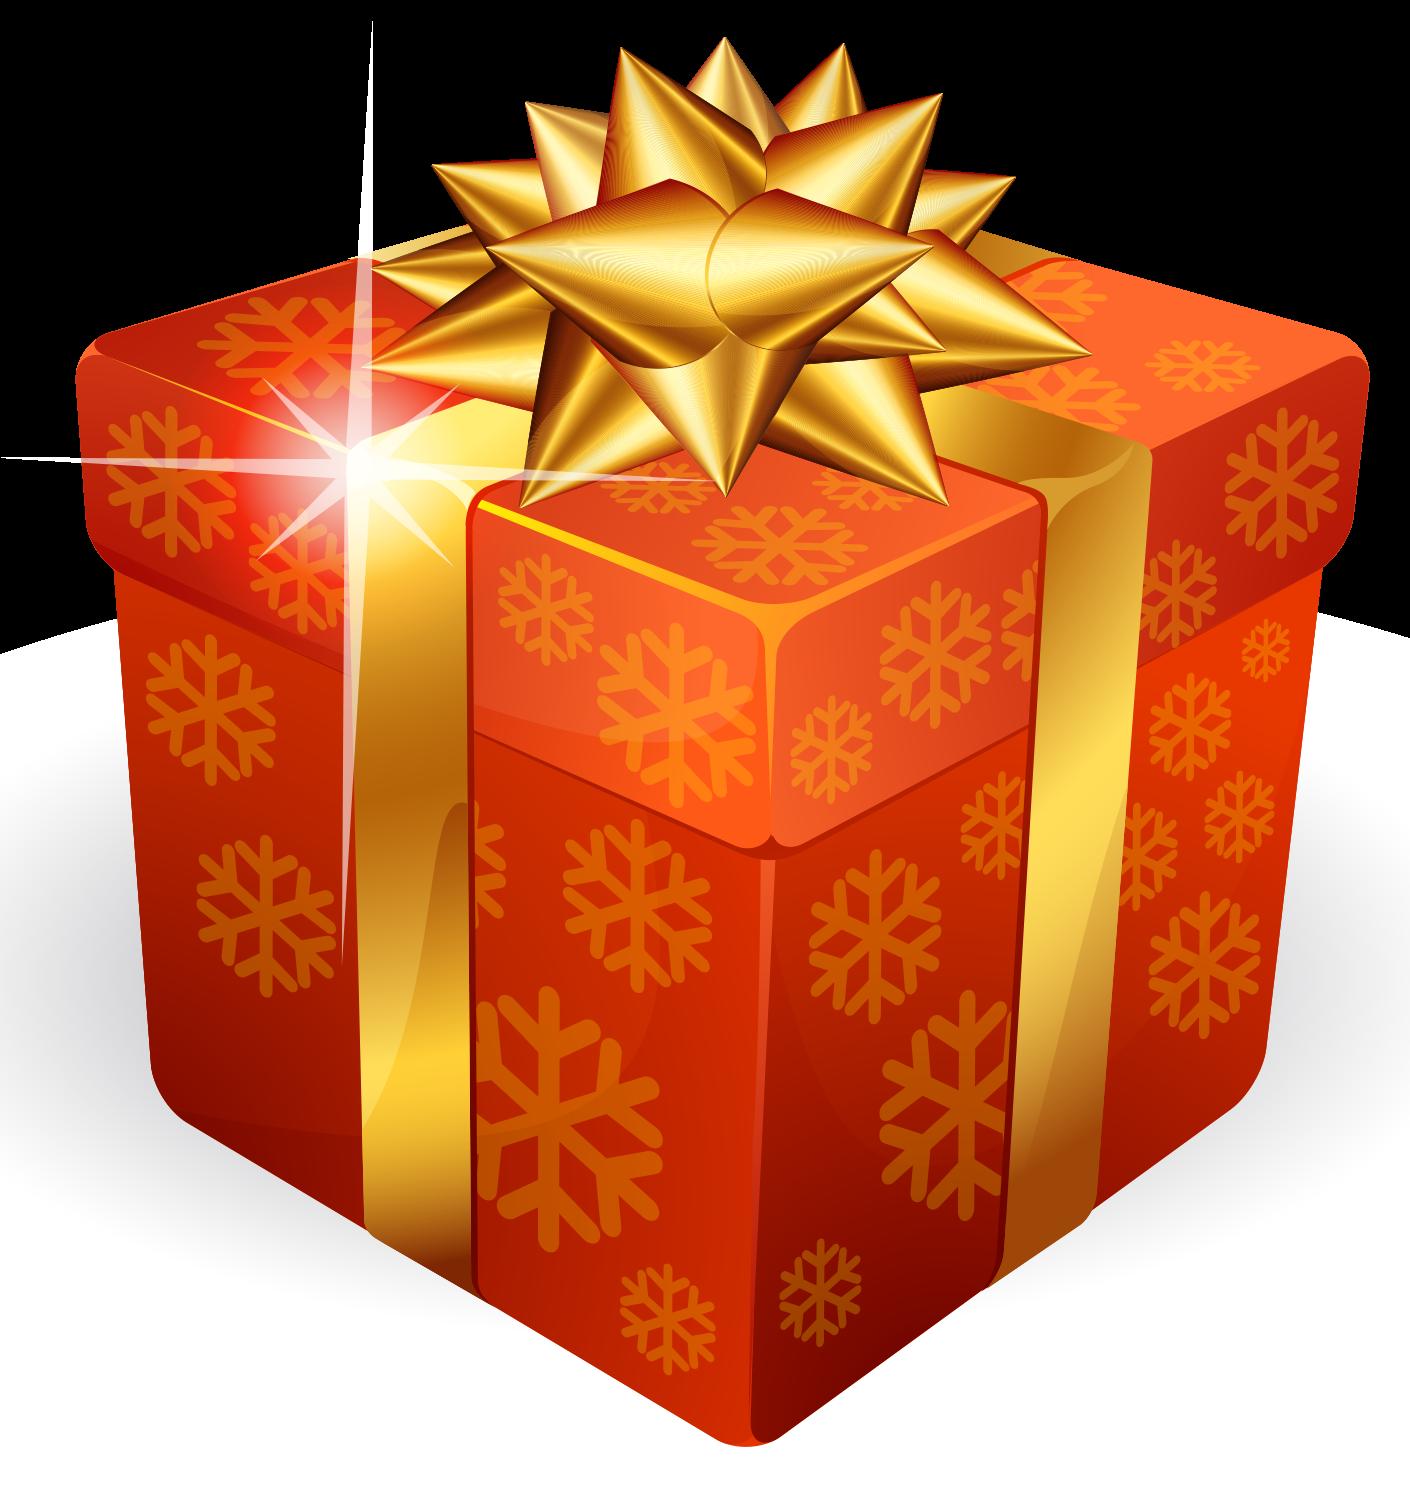 Gift images bdfjade pack. Clipart present orange